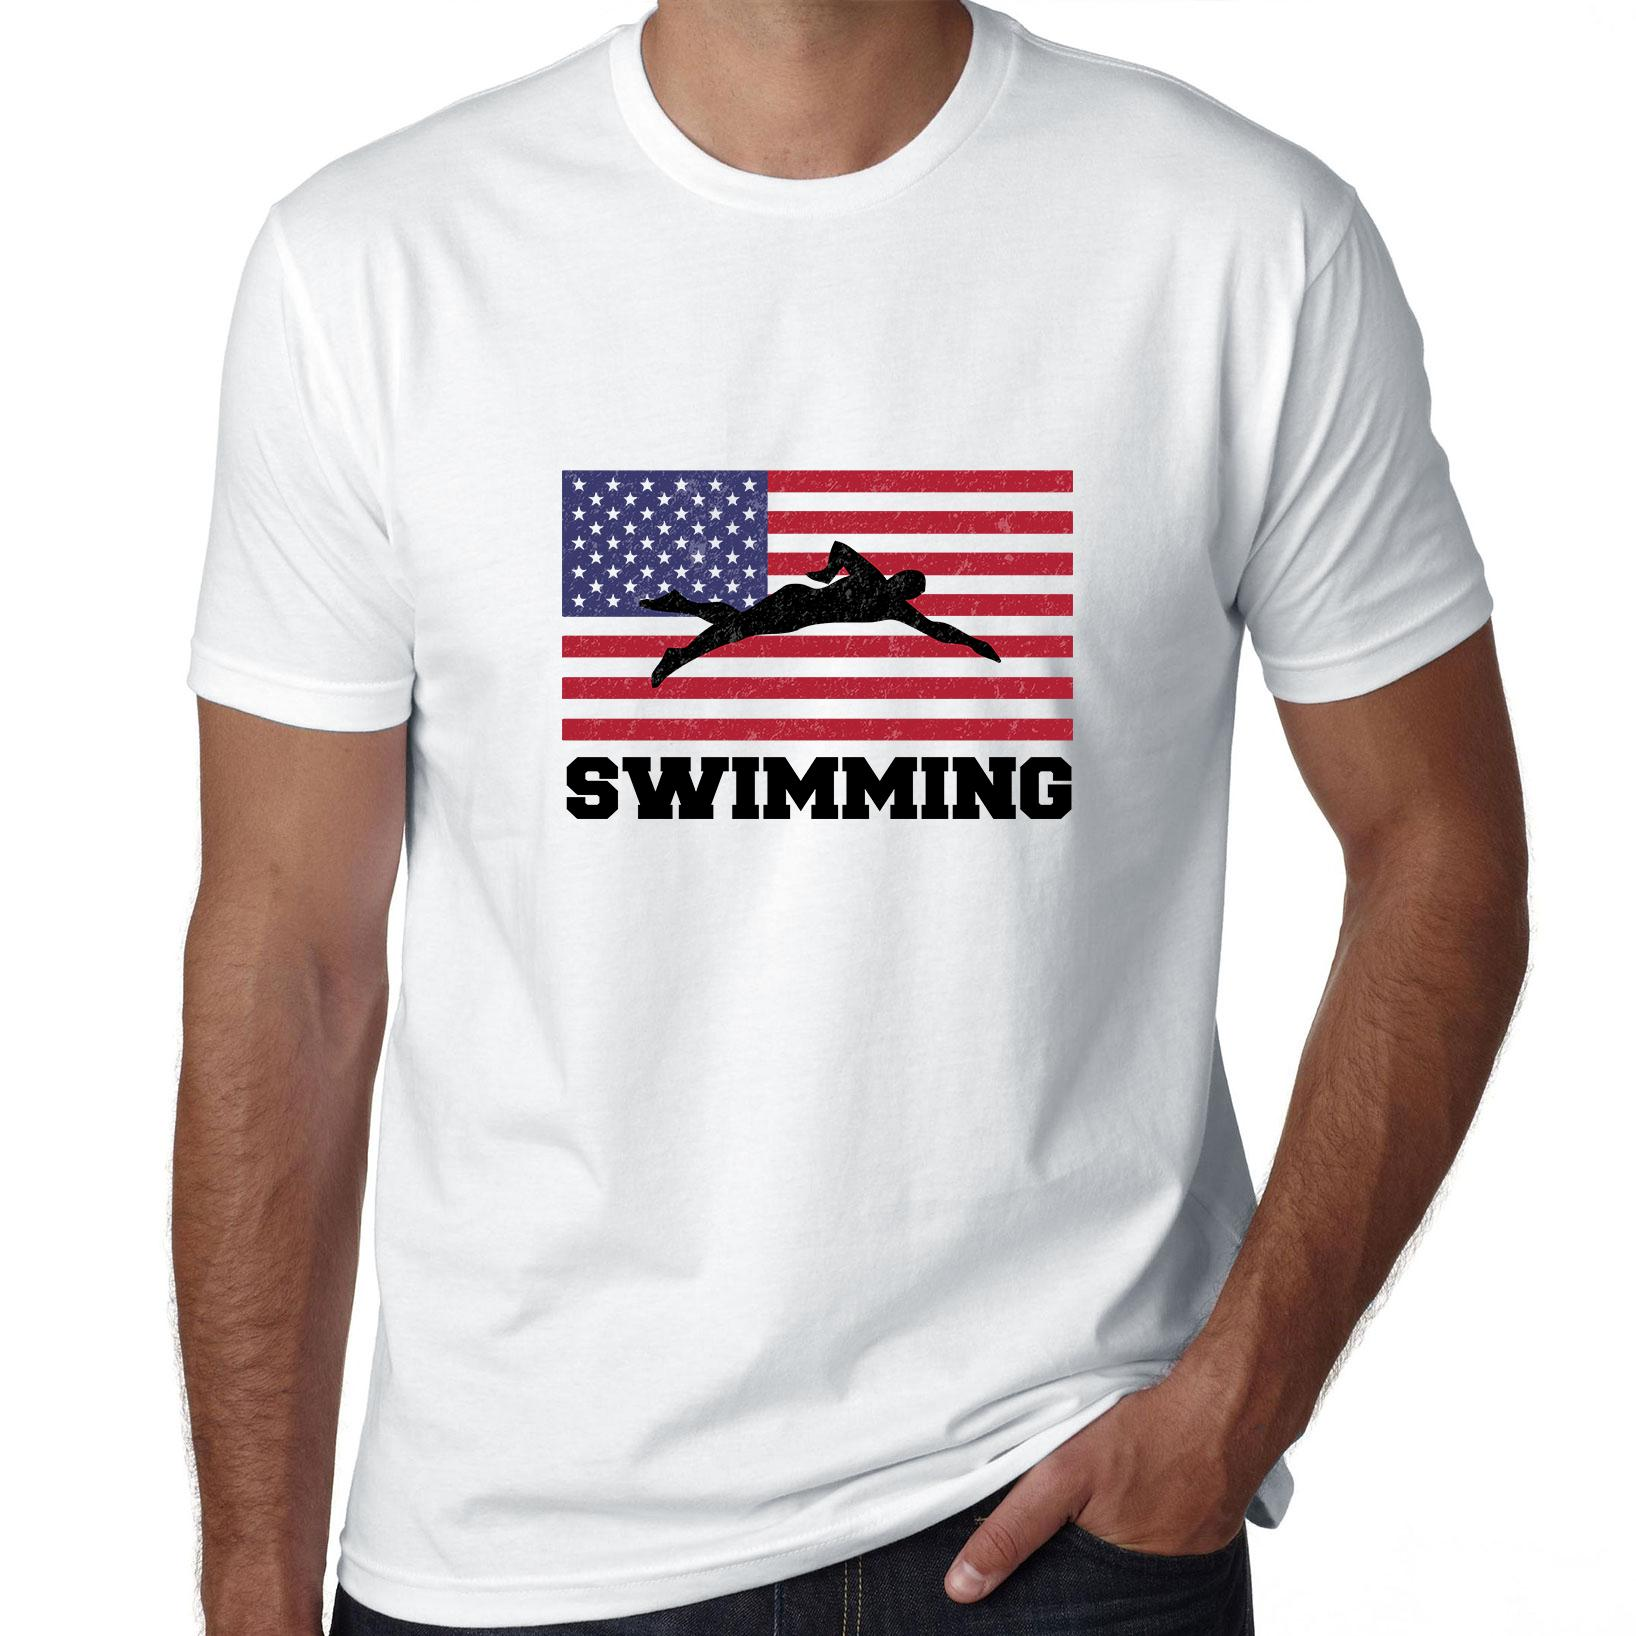 USA Olympic - Swimming - Flag - Silhouette Men's T-Shirt